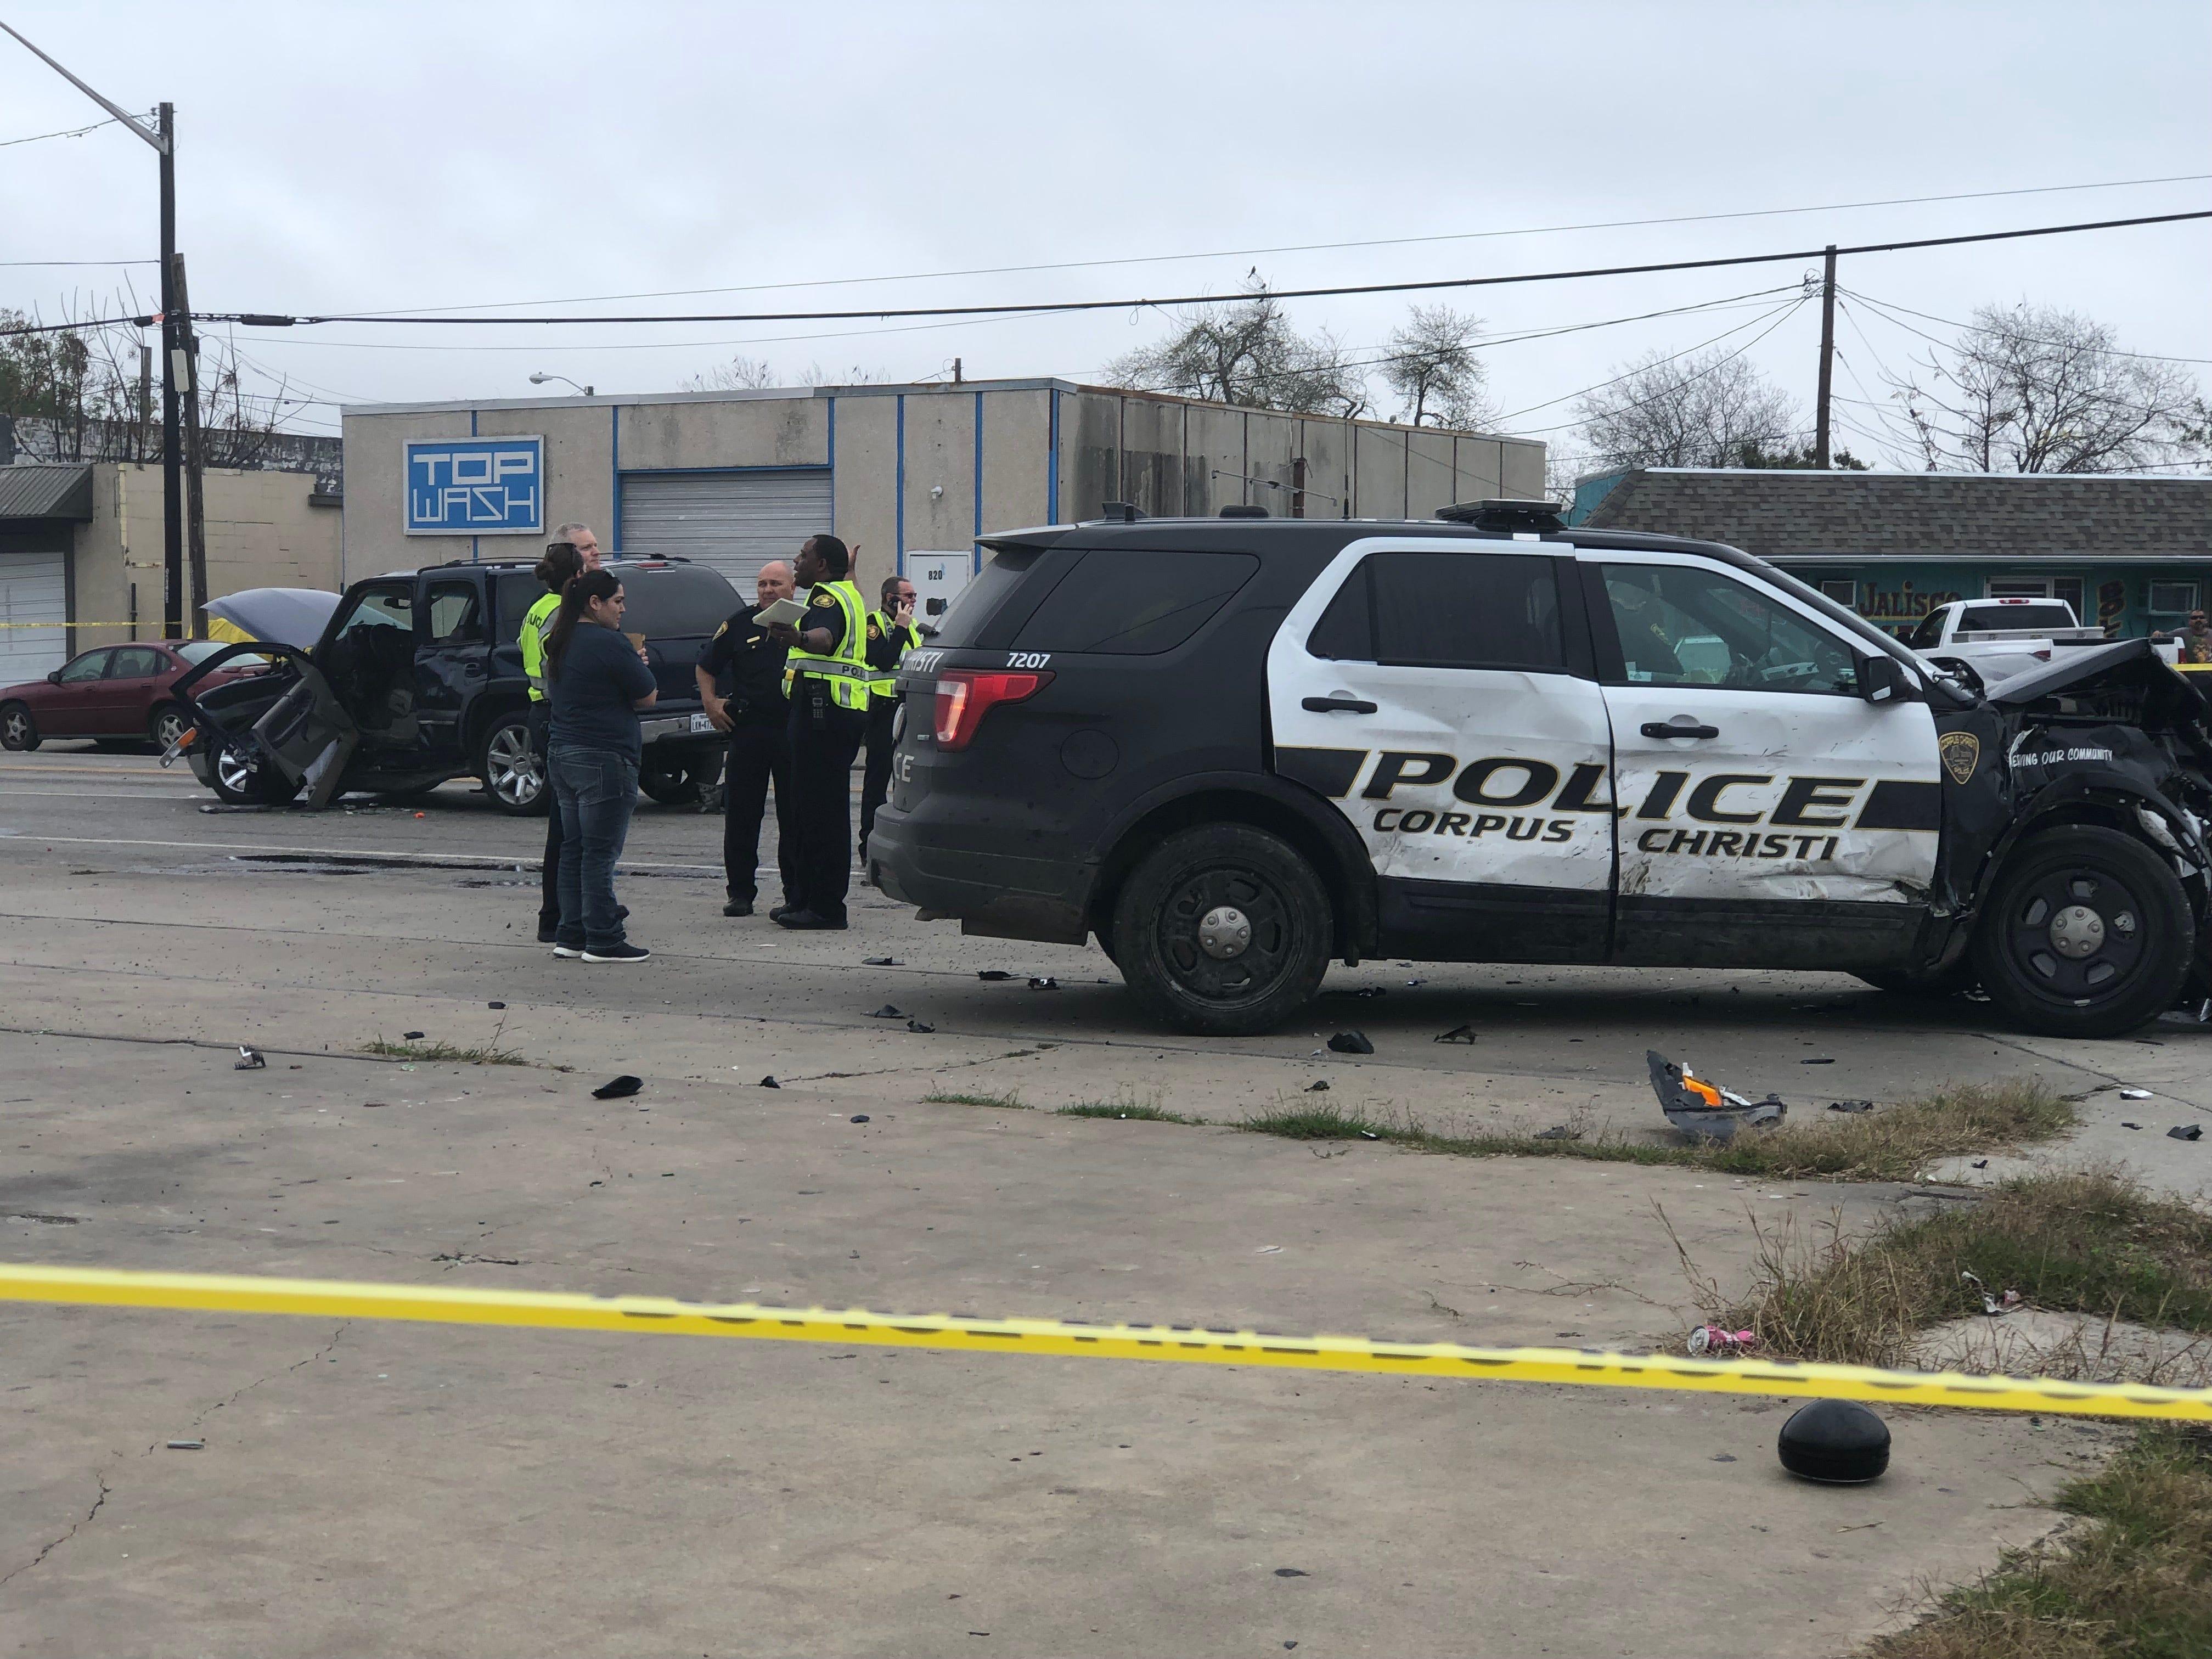 Corpus Christi police work a crash involving a marked patrol car on Port Avenue on Feb. 5, 2019.